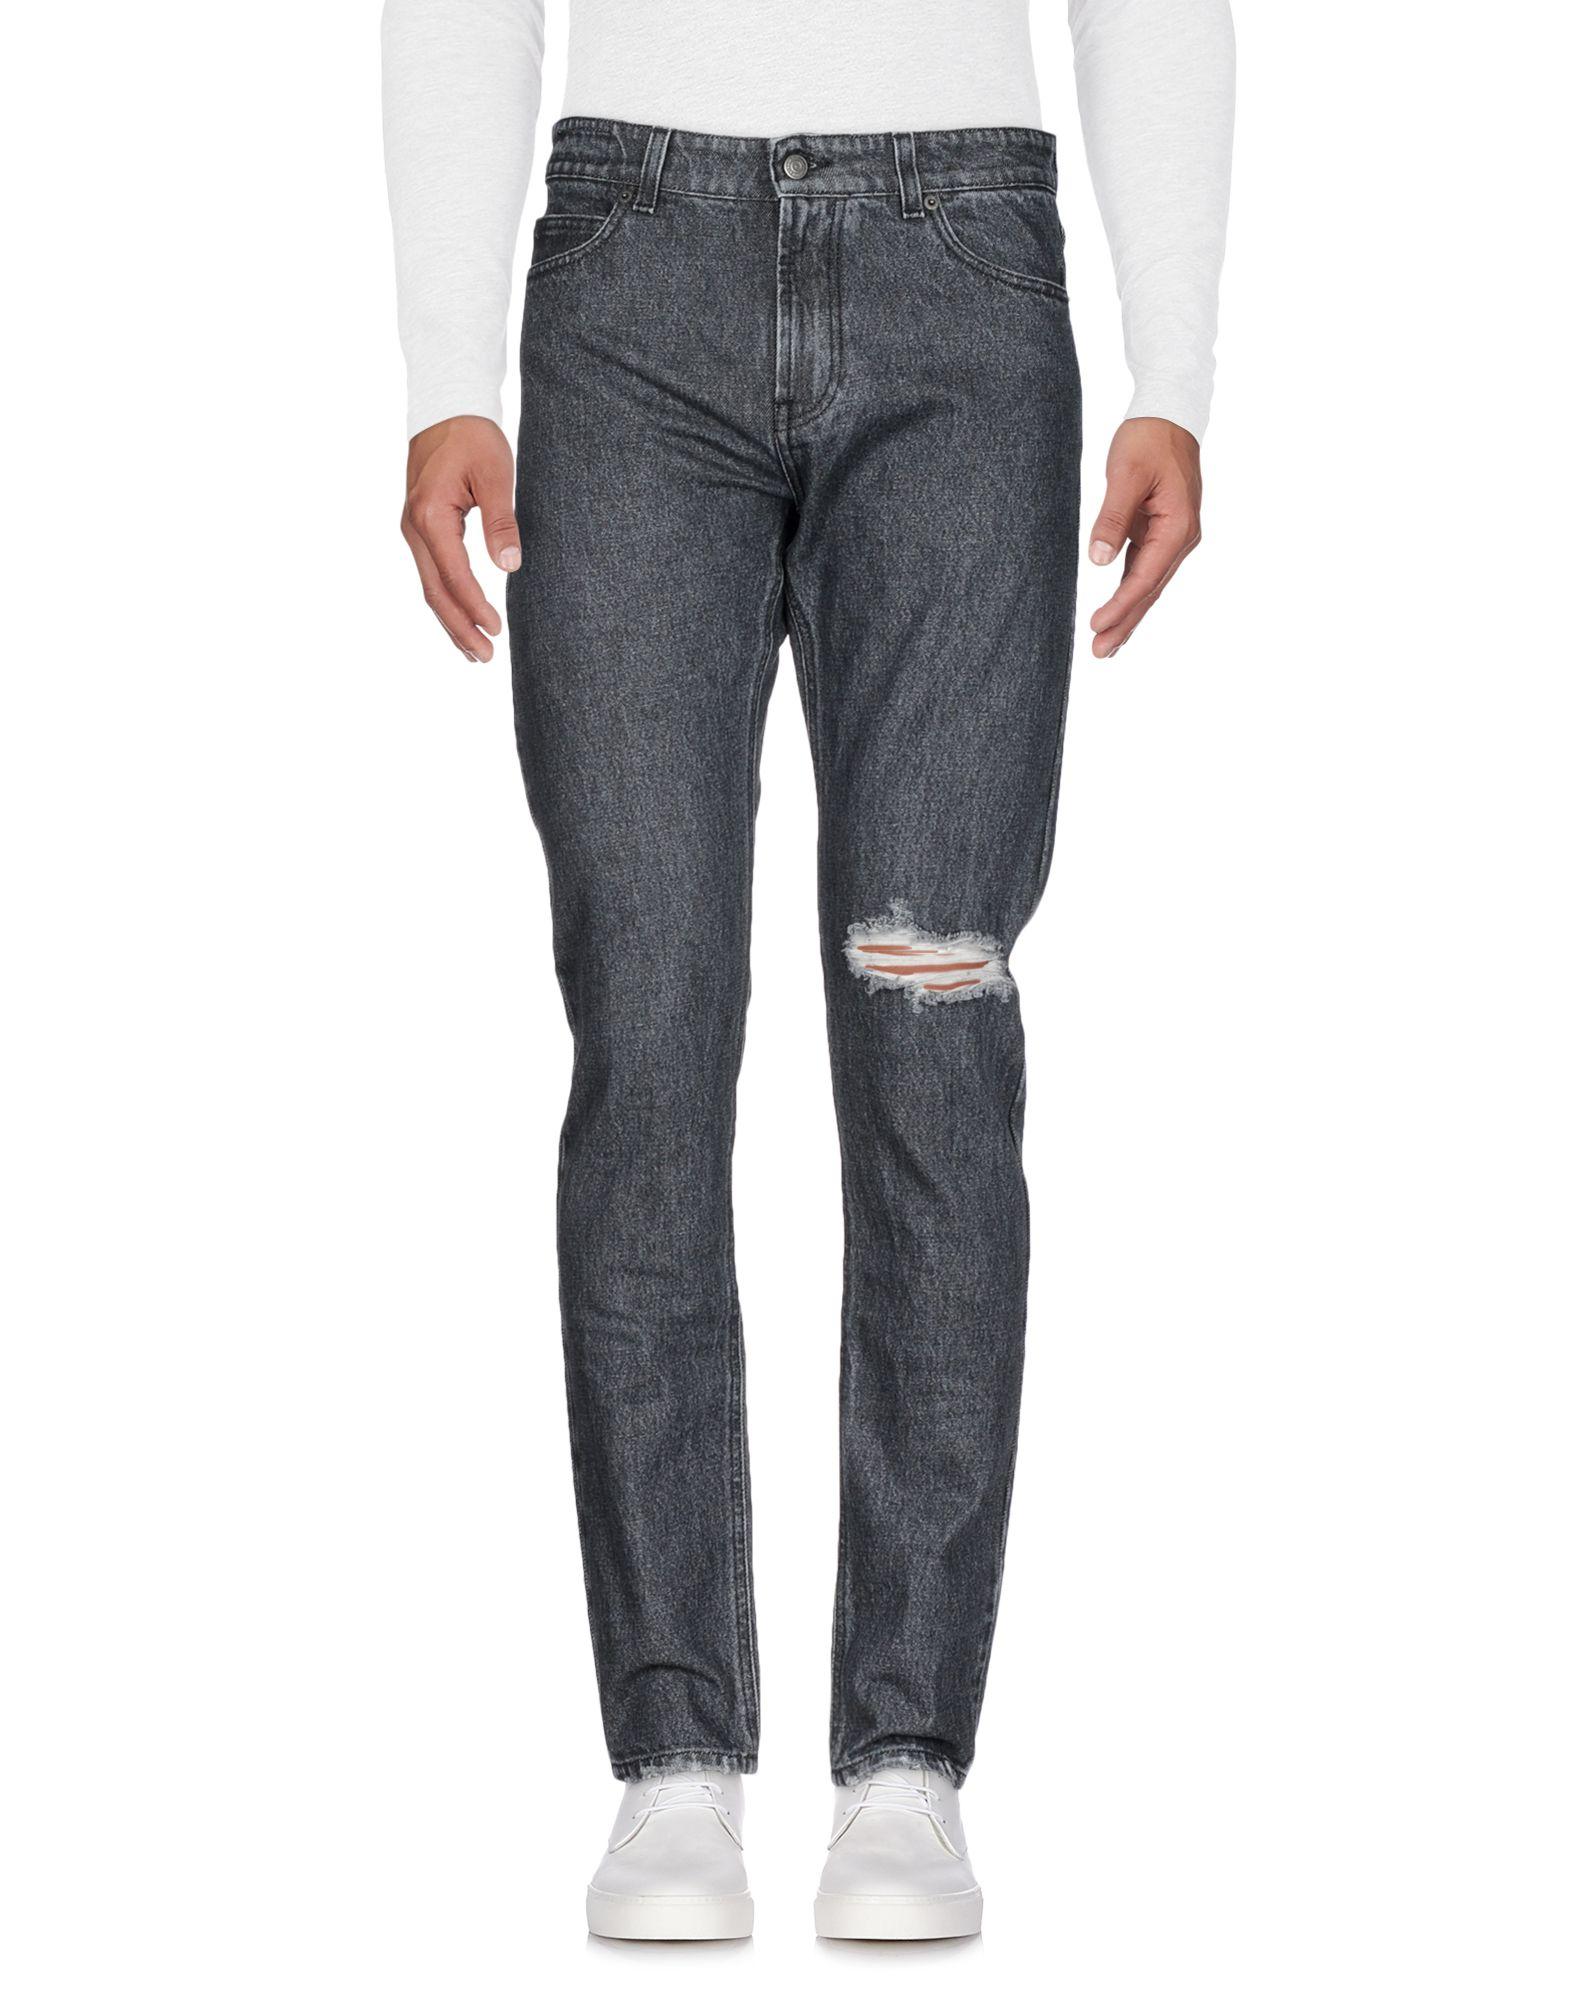 Pantaloni Jeans Paura Donna - Acquista online su